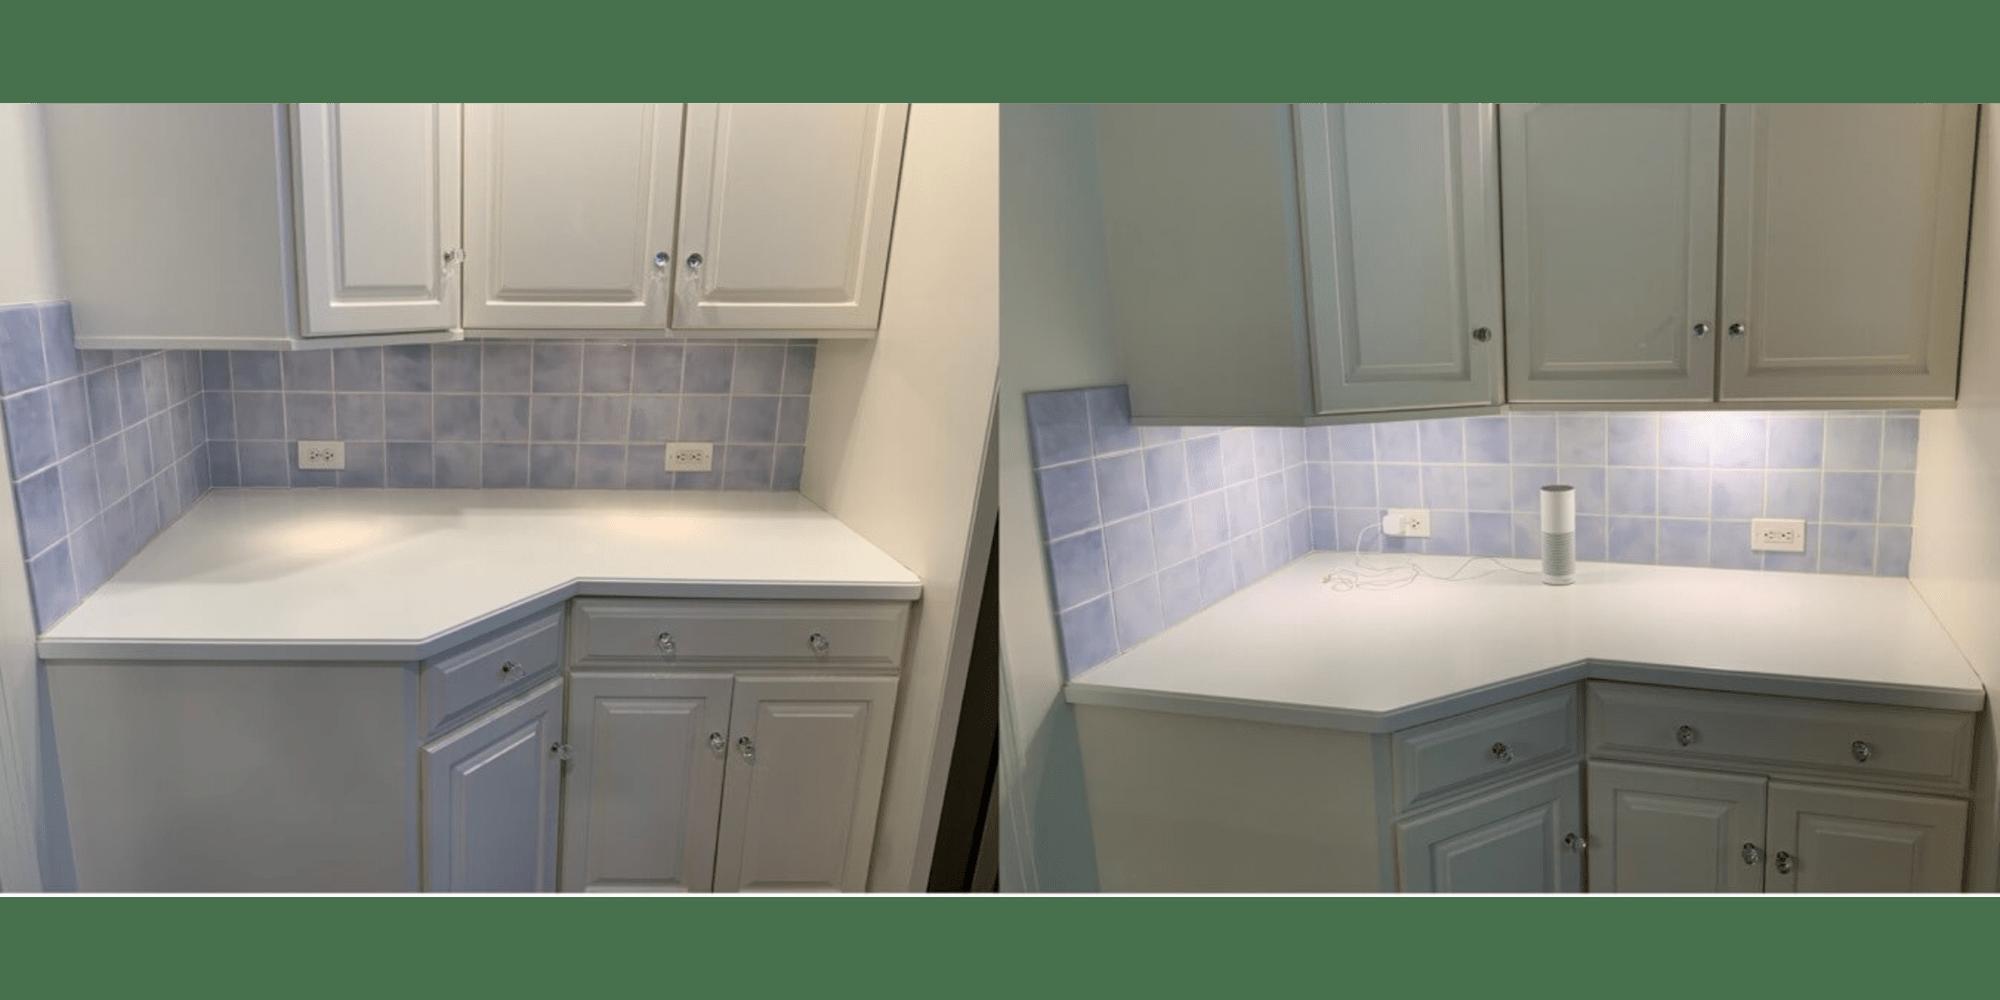 oled light panels transform kitchen